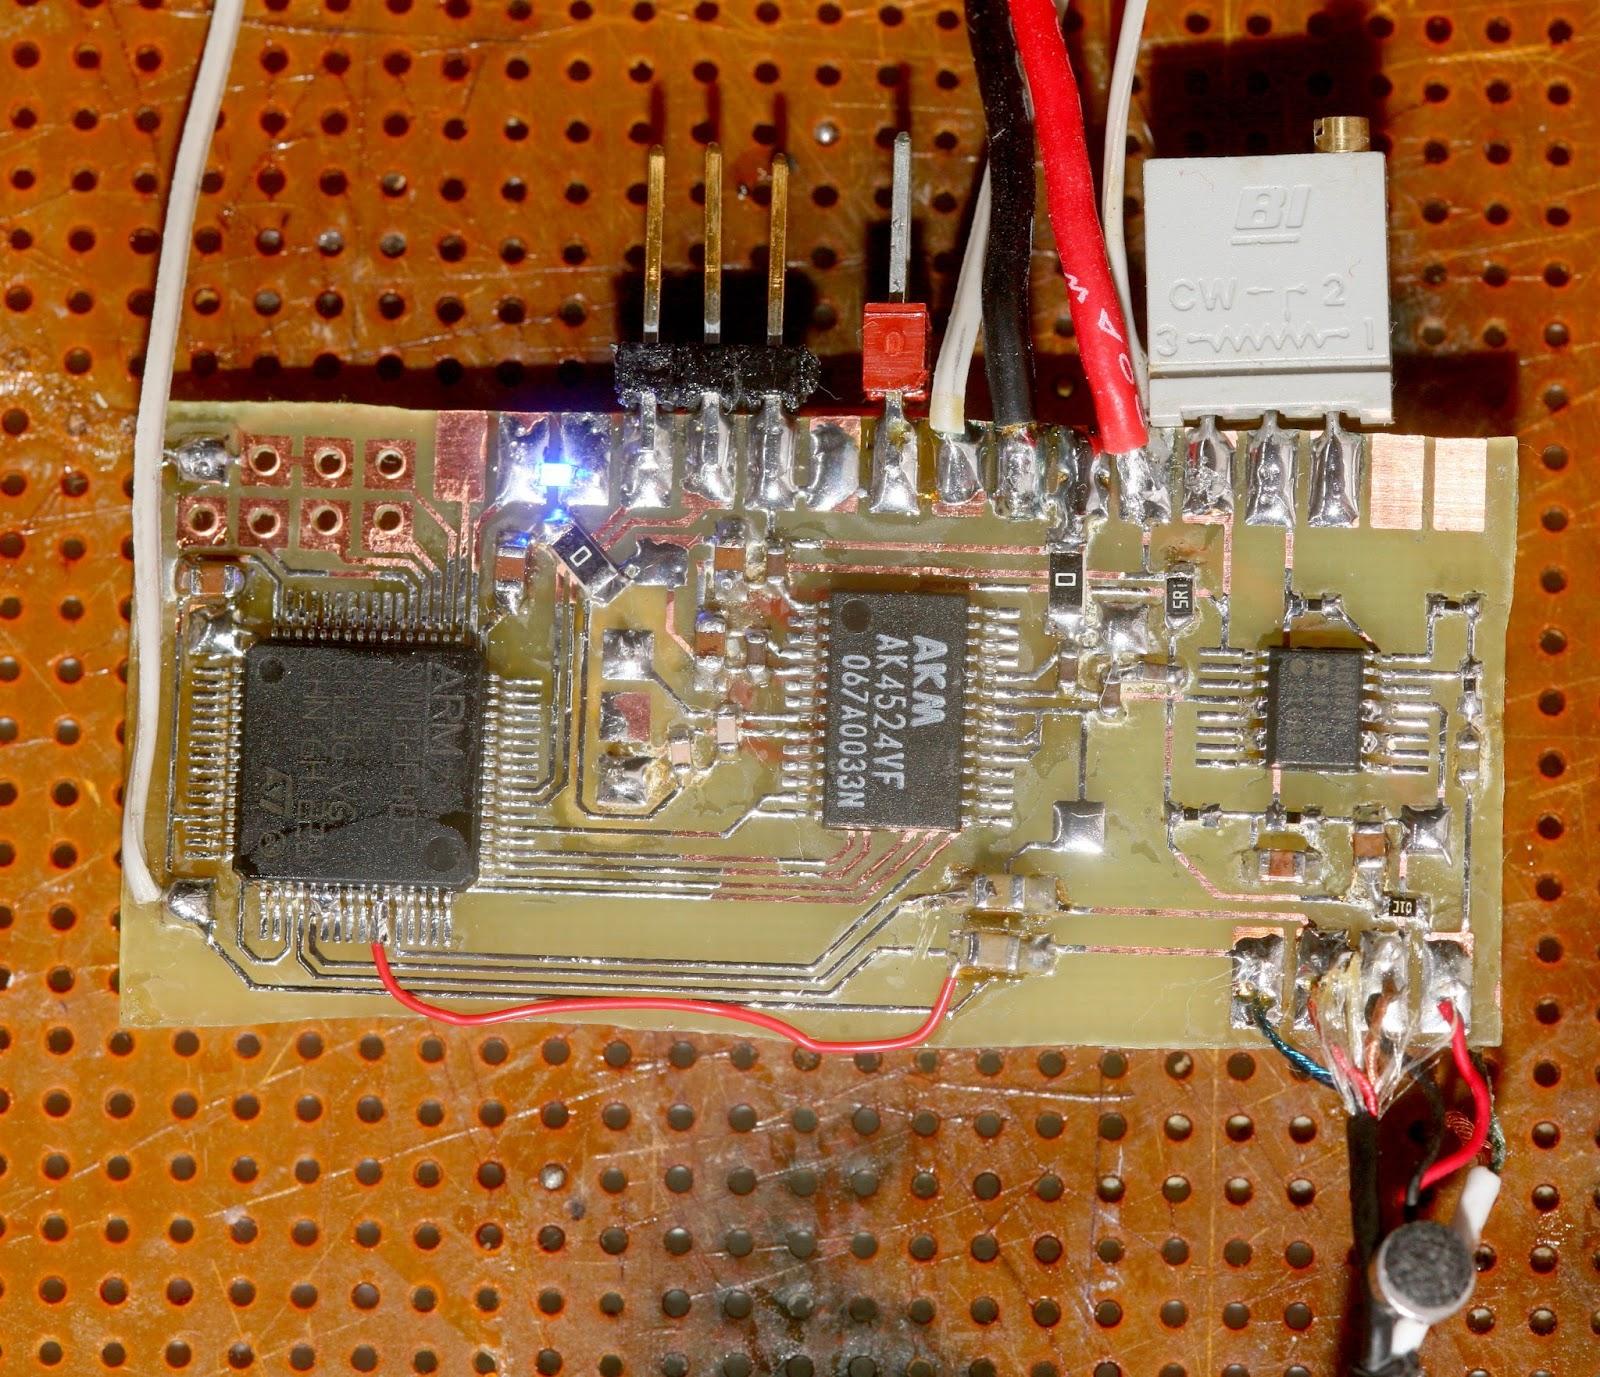 Stm32 24 Bit Adc